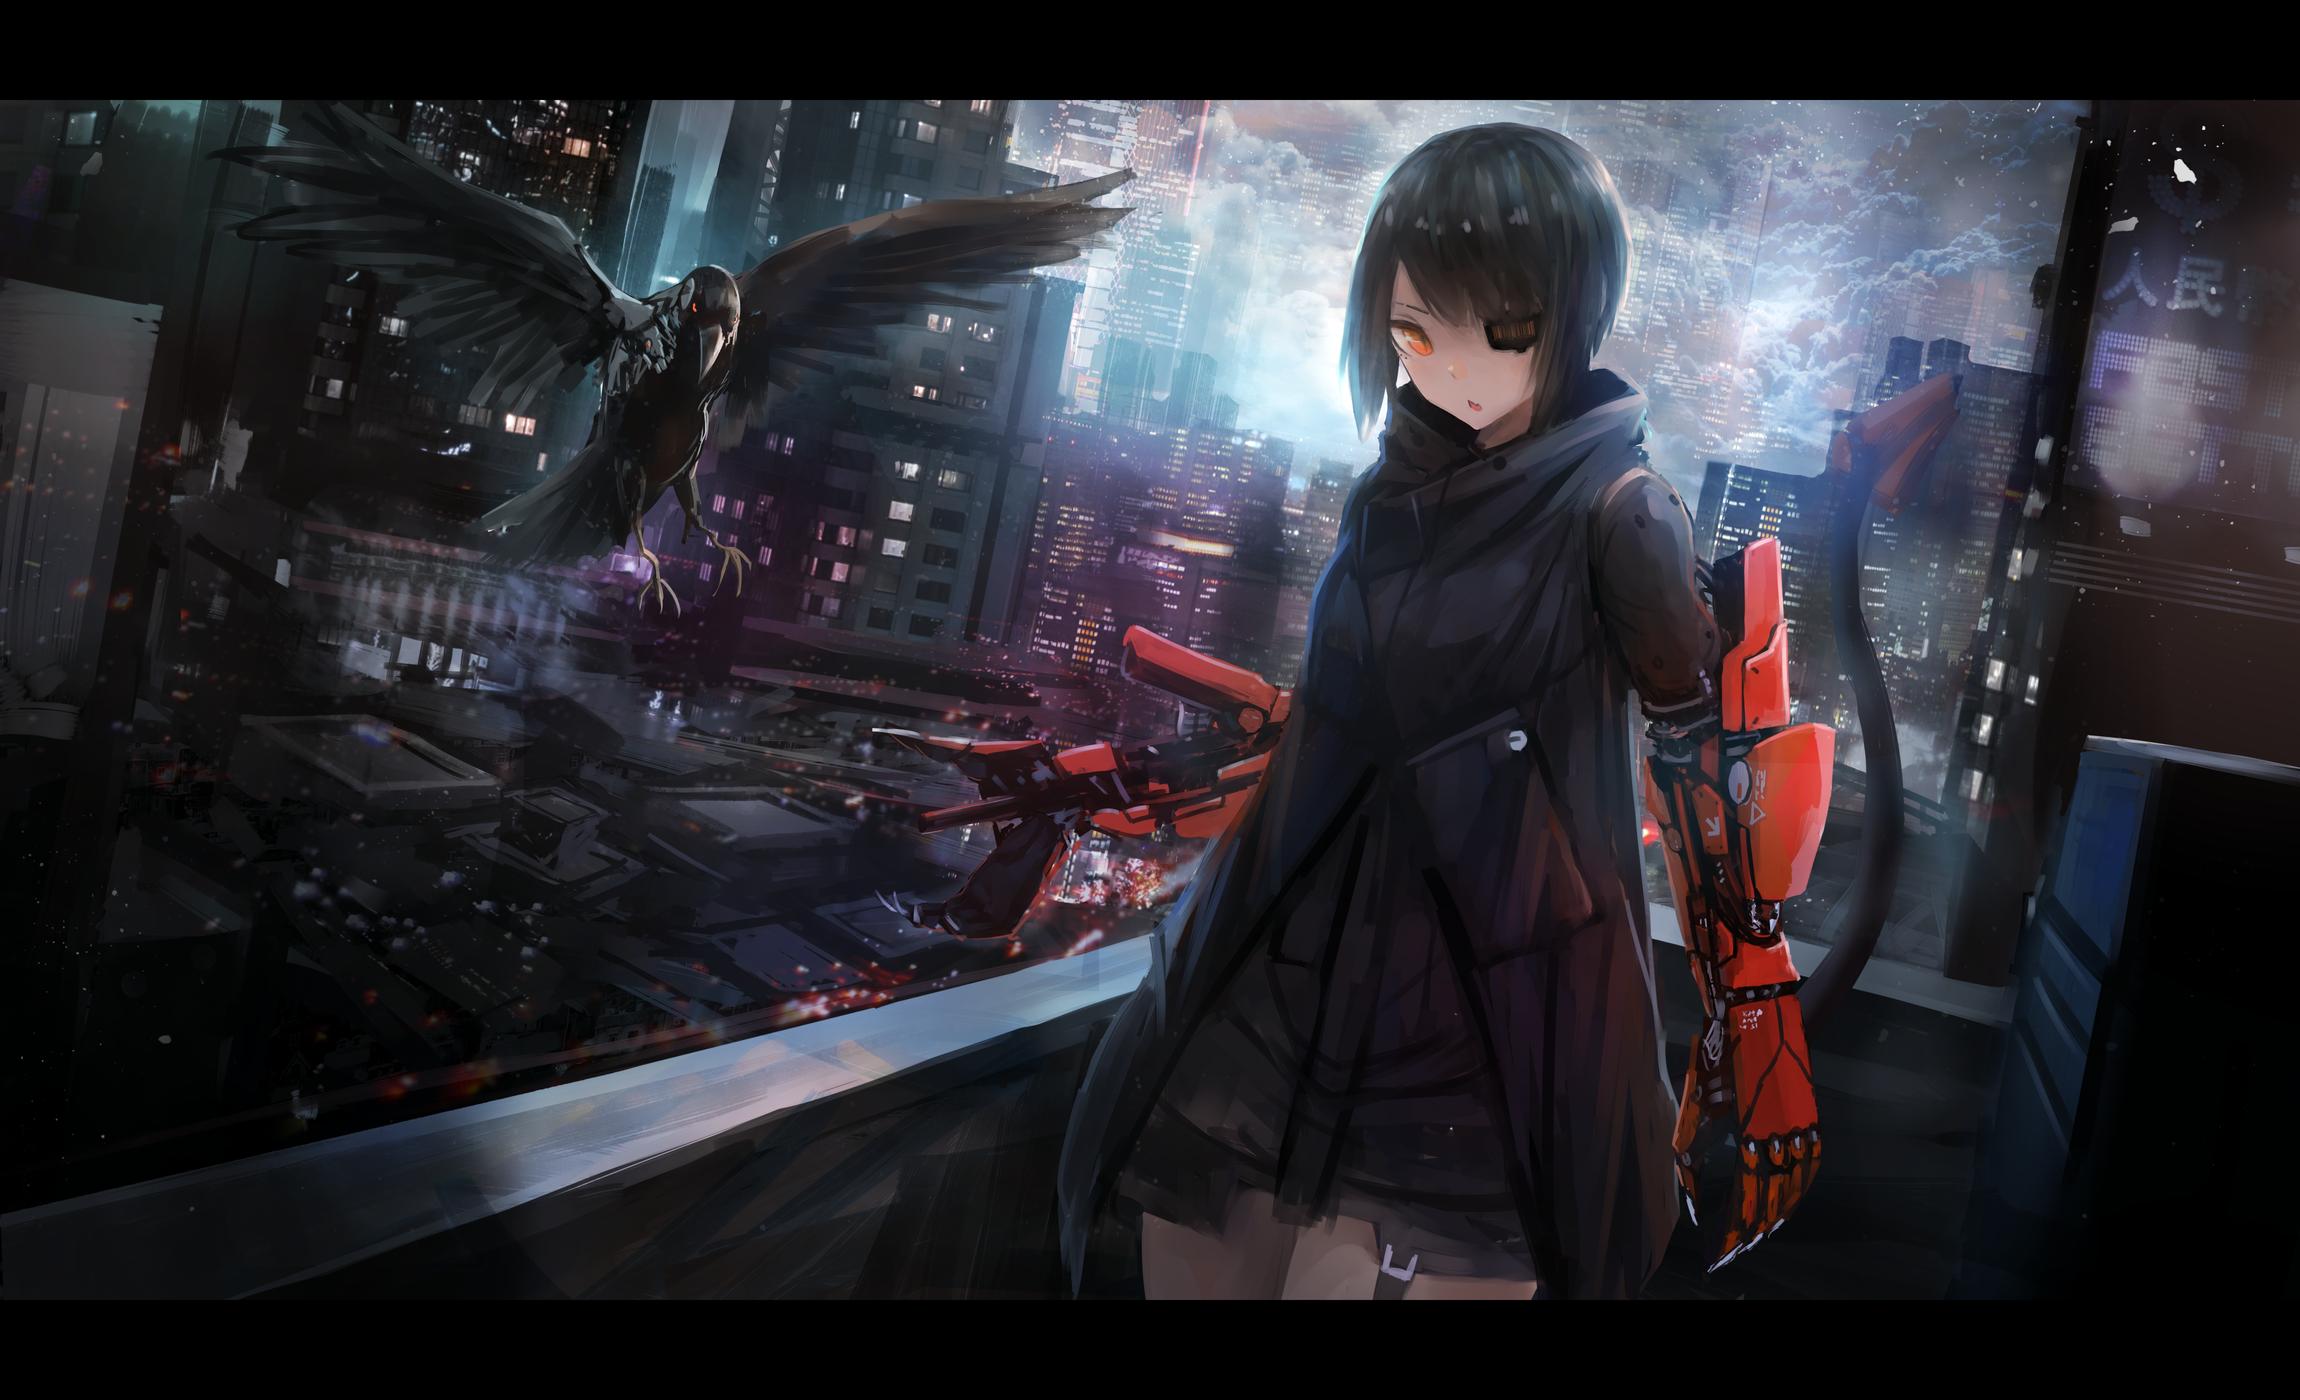 Votre fond d'écran du moment - Page 12 Anime-girl-cyberpunk-sci-fi-futuristic-one-eye-cape-anime-3591